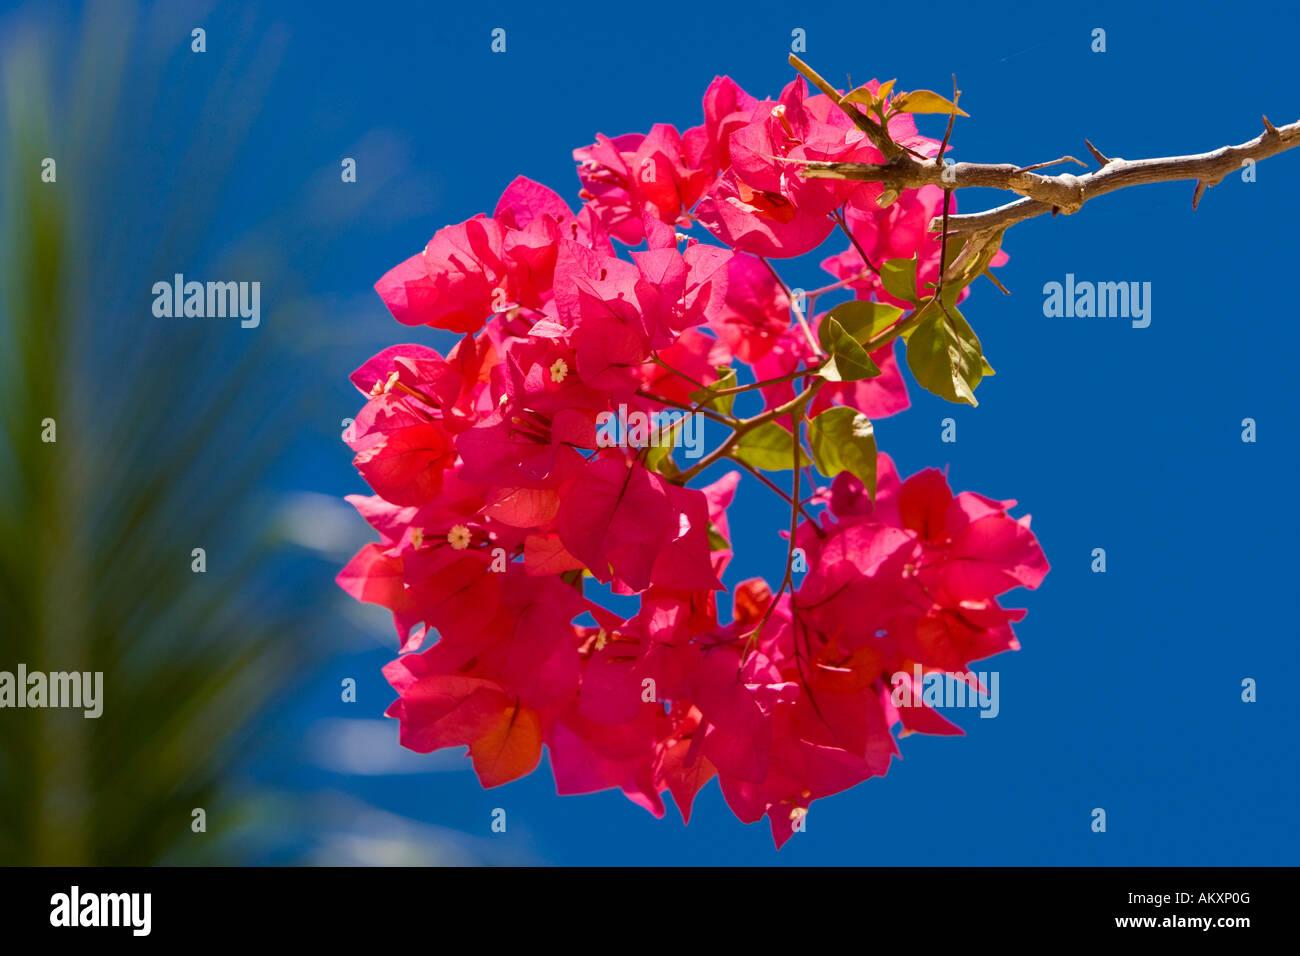 Blossoming bougainvillaea (bougainvillaea sp.). Stock Photo